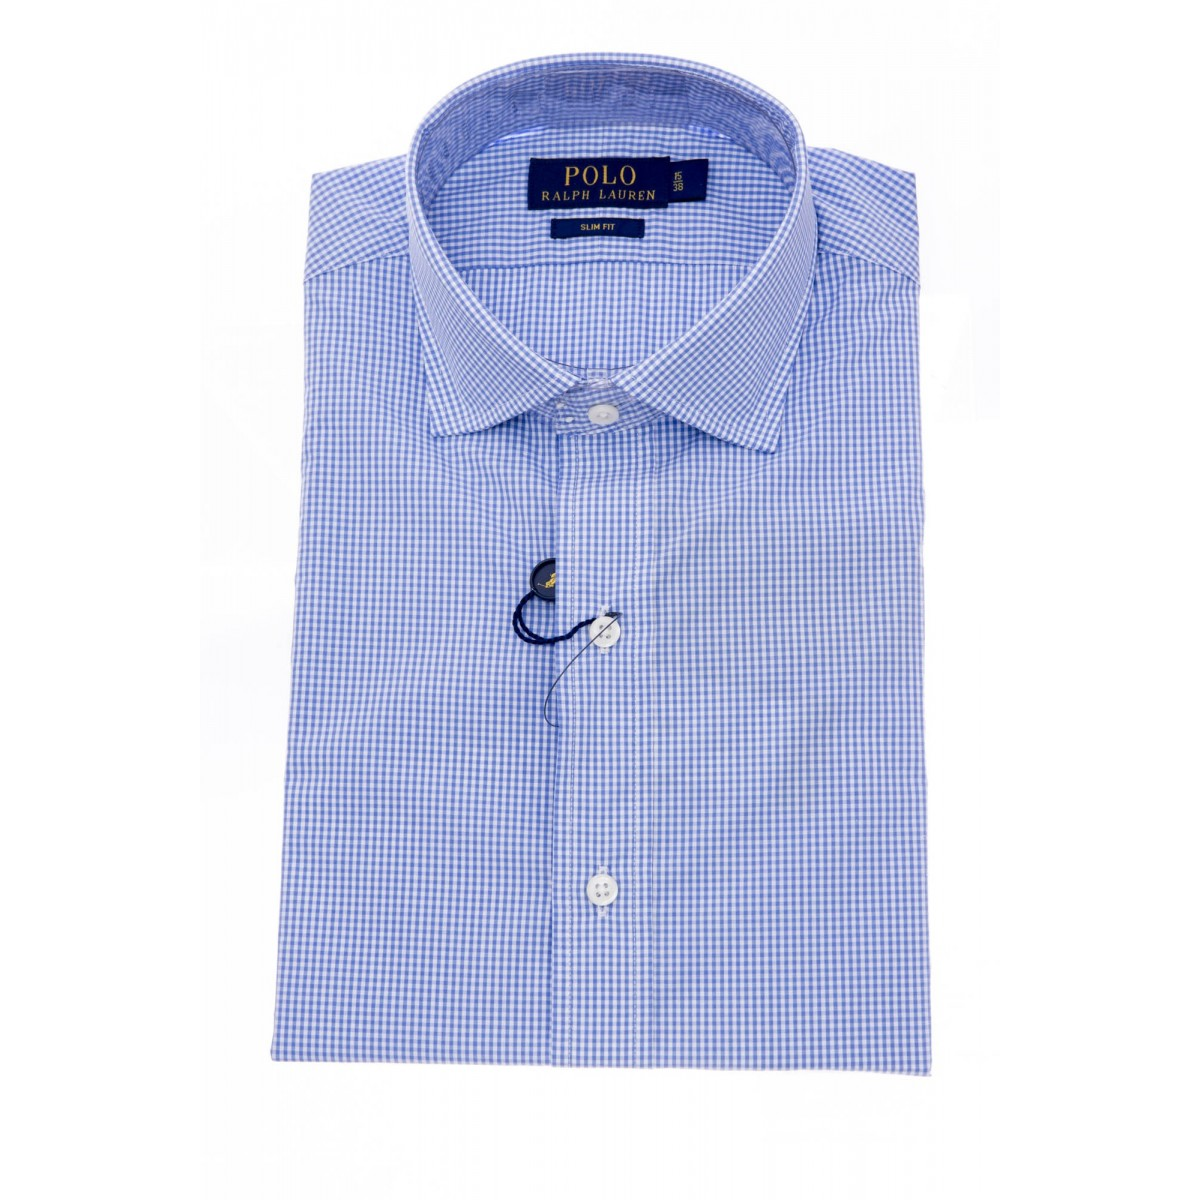 Camicia uomo Ralph lauren - A02wzz05cyy00 slim